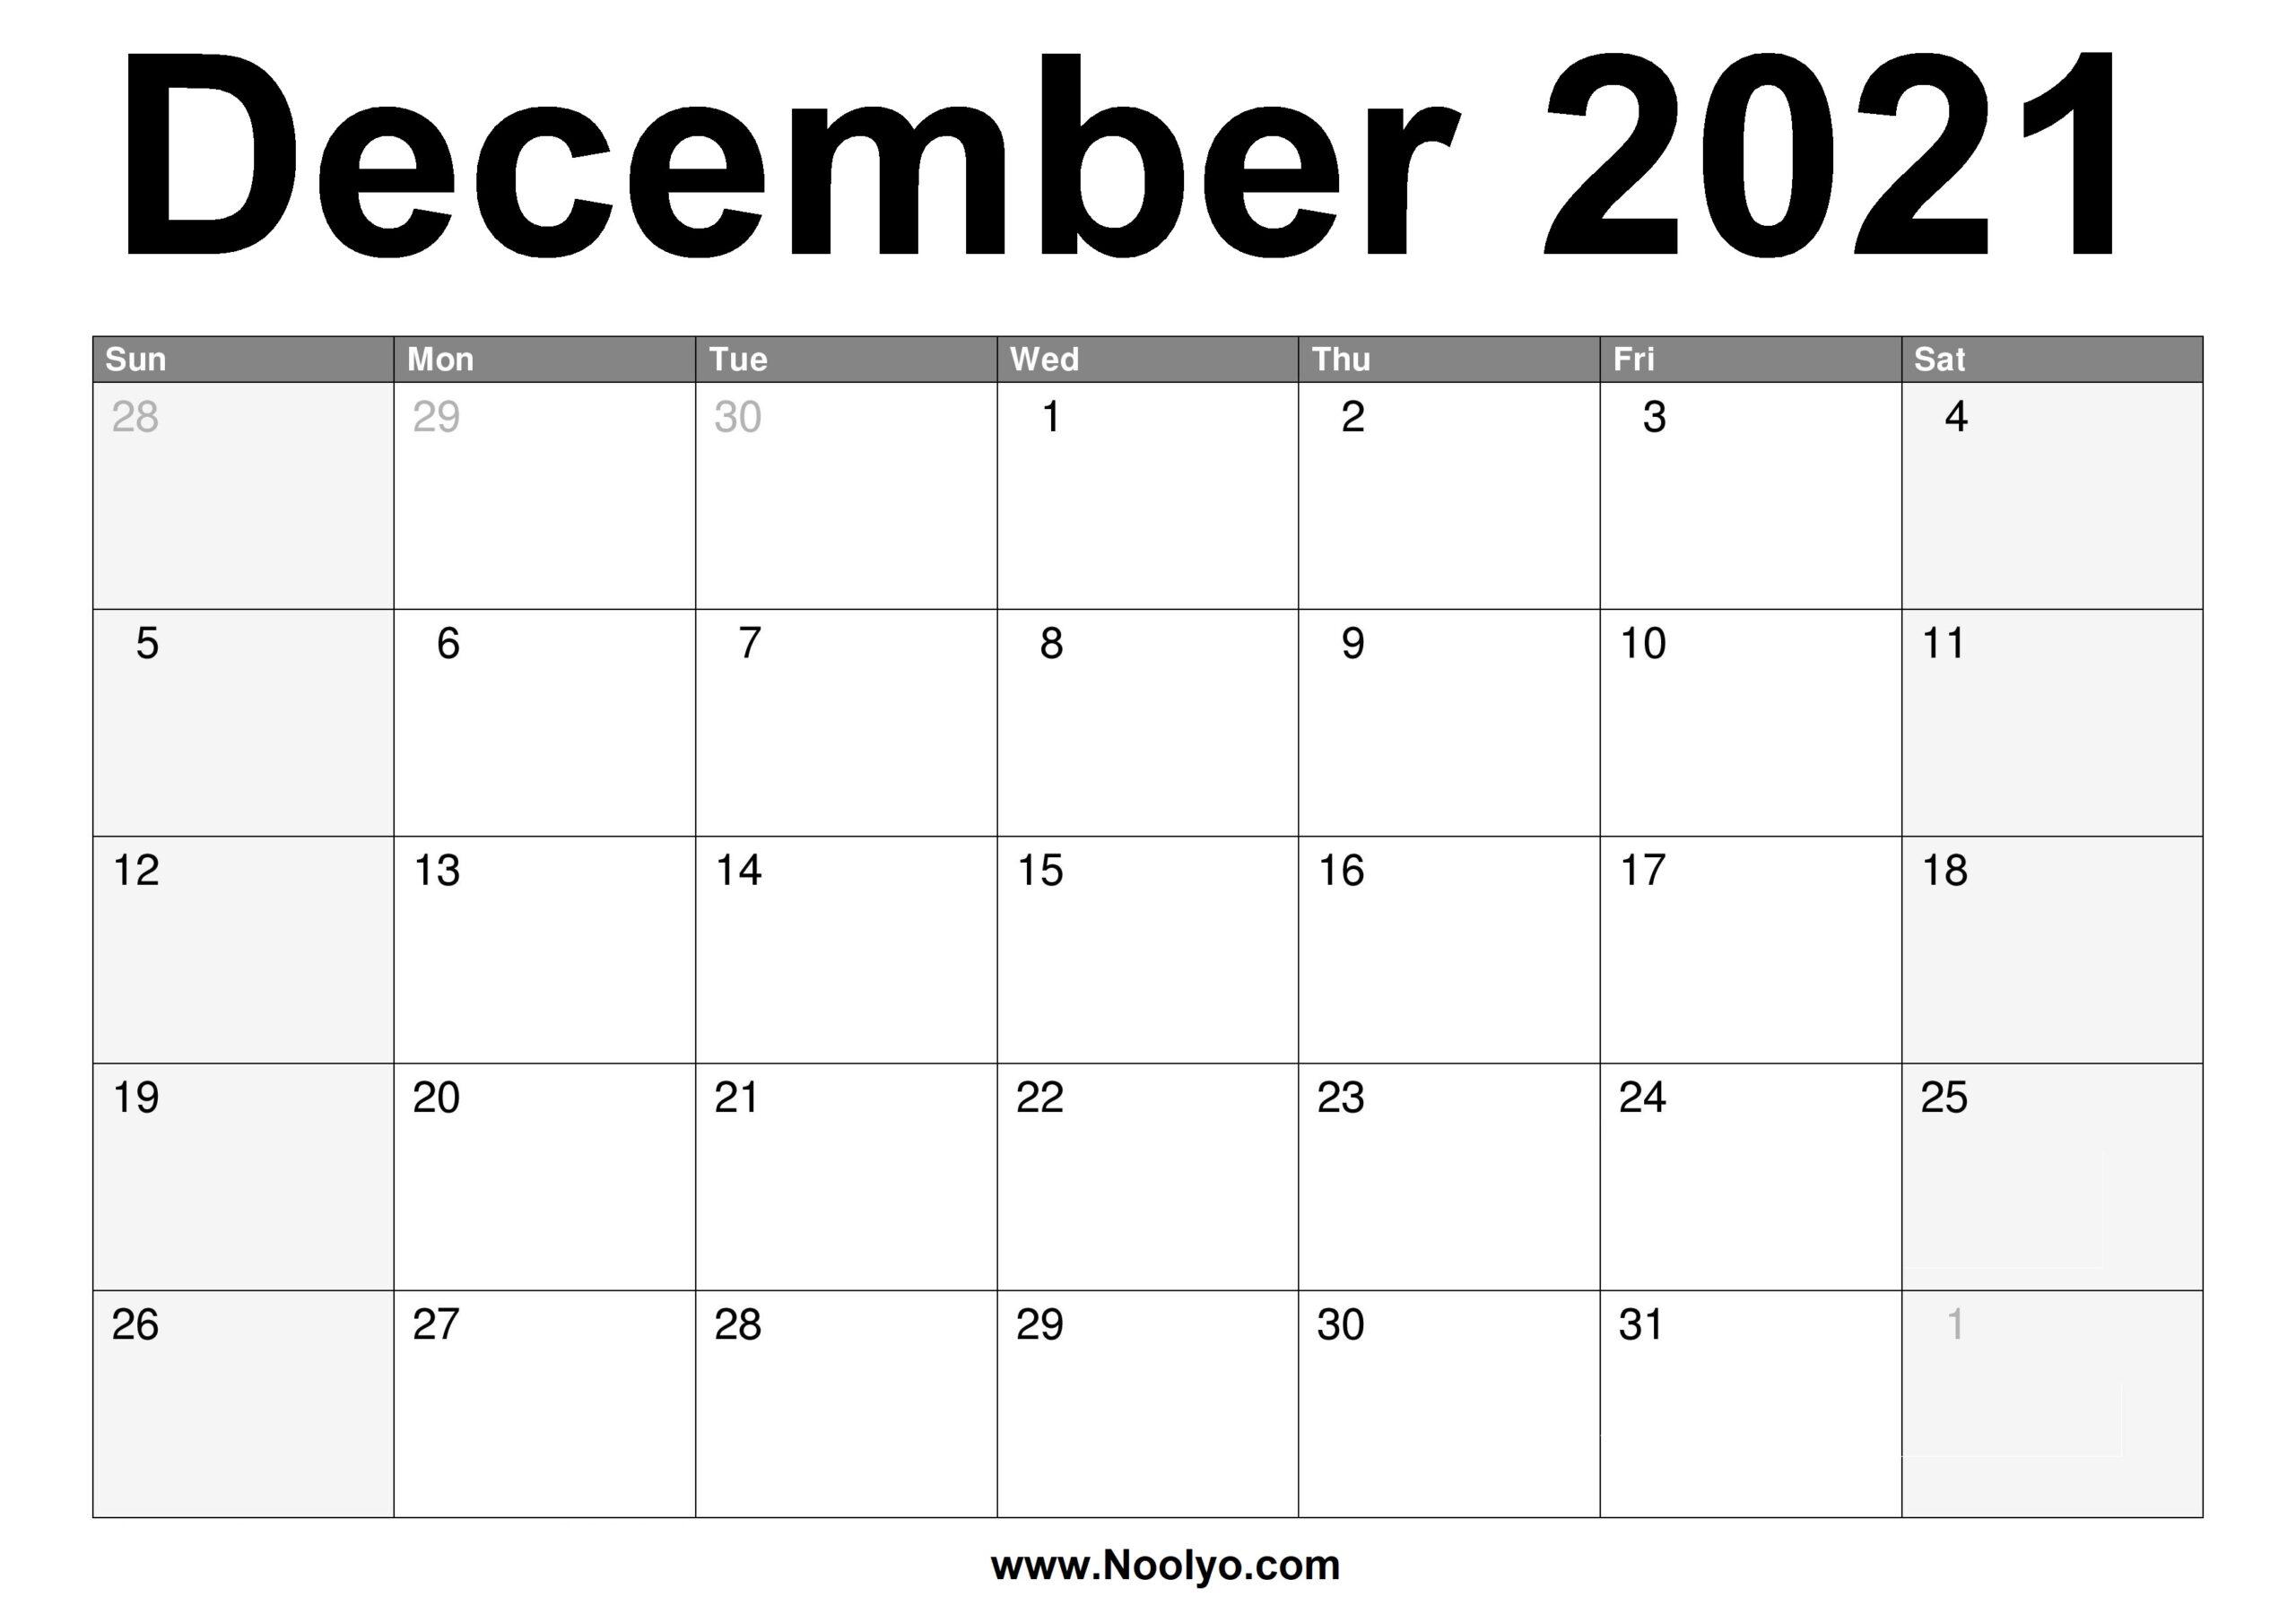 December 2021 Calendar Printable – Free Download – Noolyo